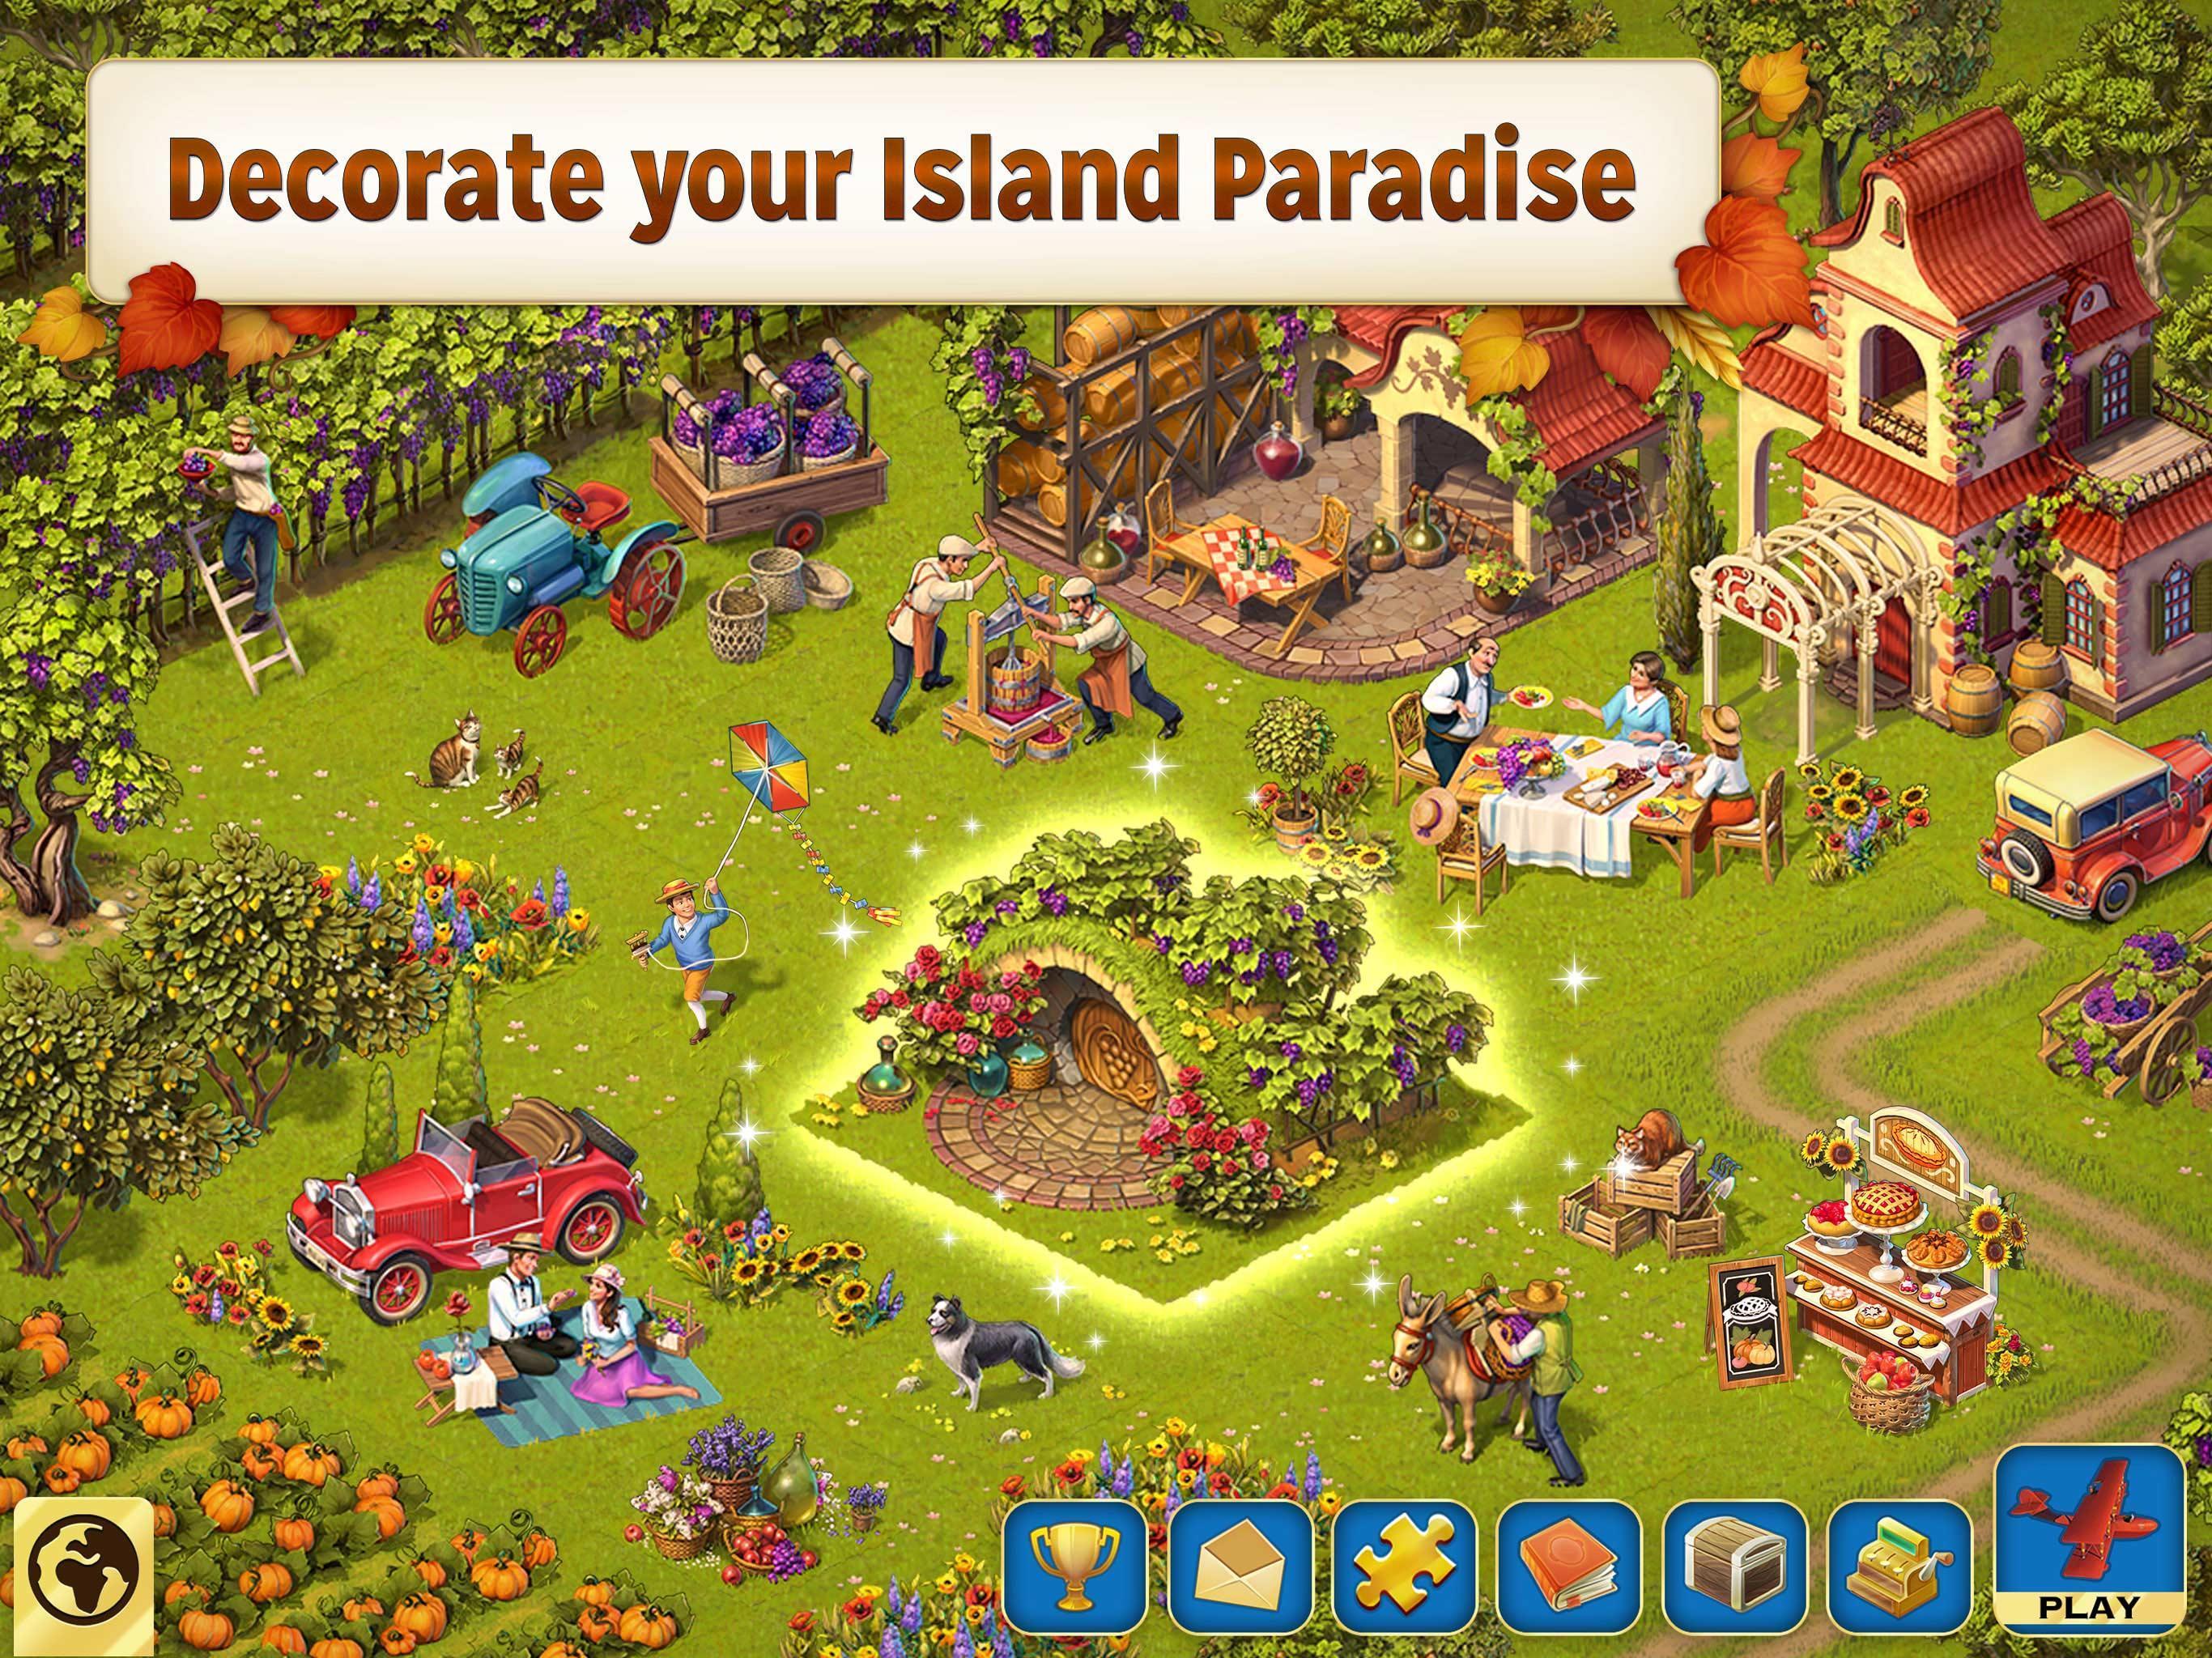 Pearl's Peril - Hidden Object Game 5.07.2984 Screenshot 17